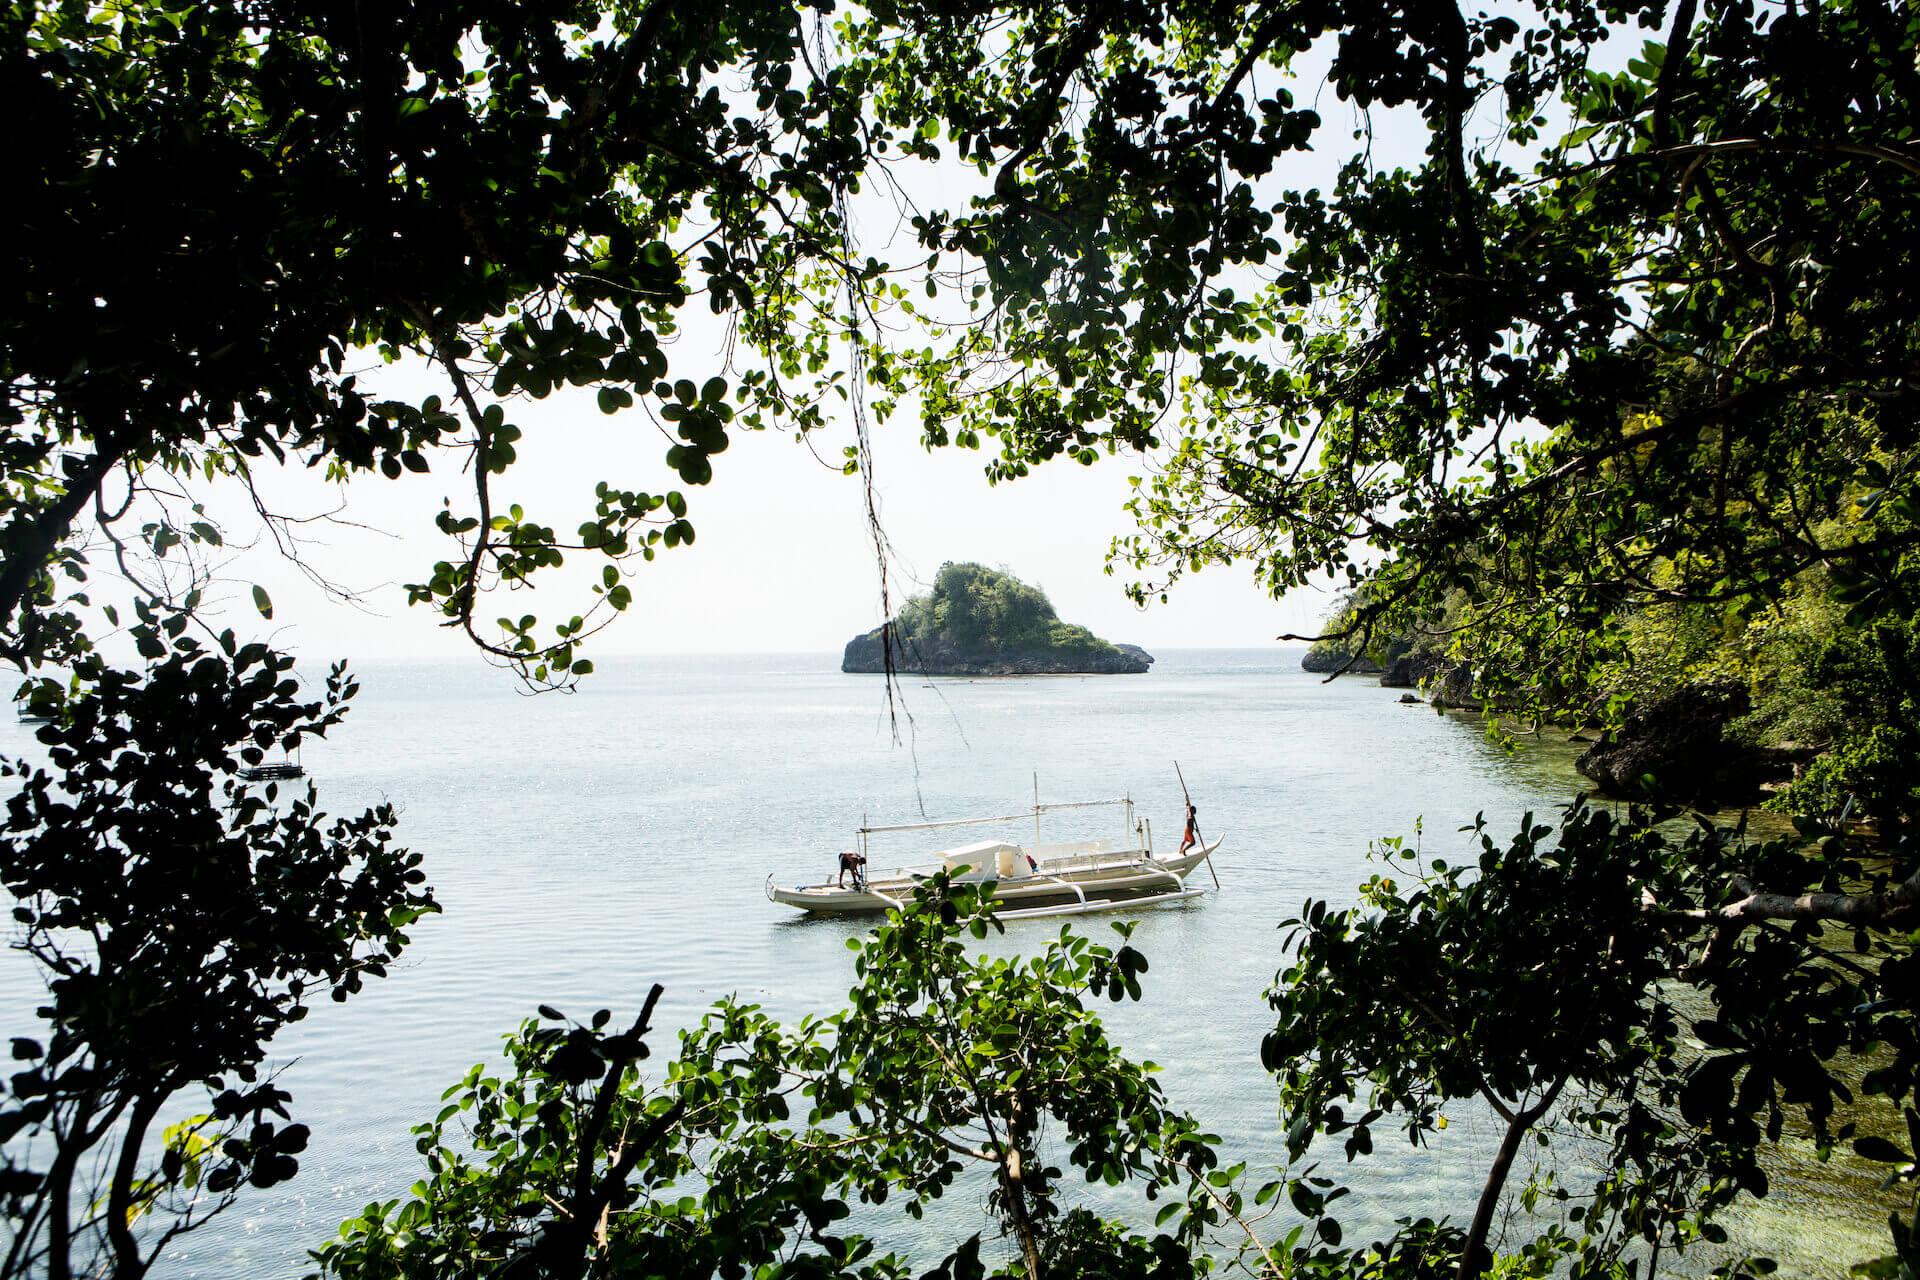 View of sea and boat from Danjugan, Negros. Photo by Geric Cruz